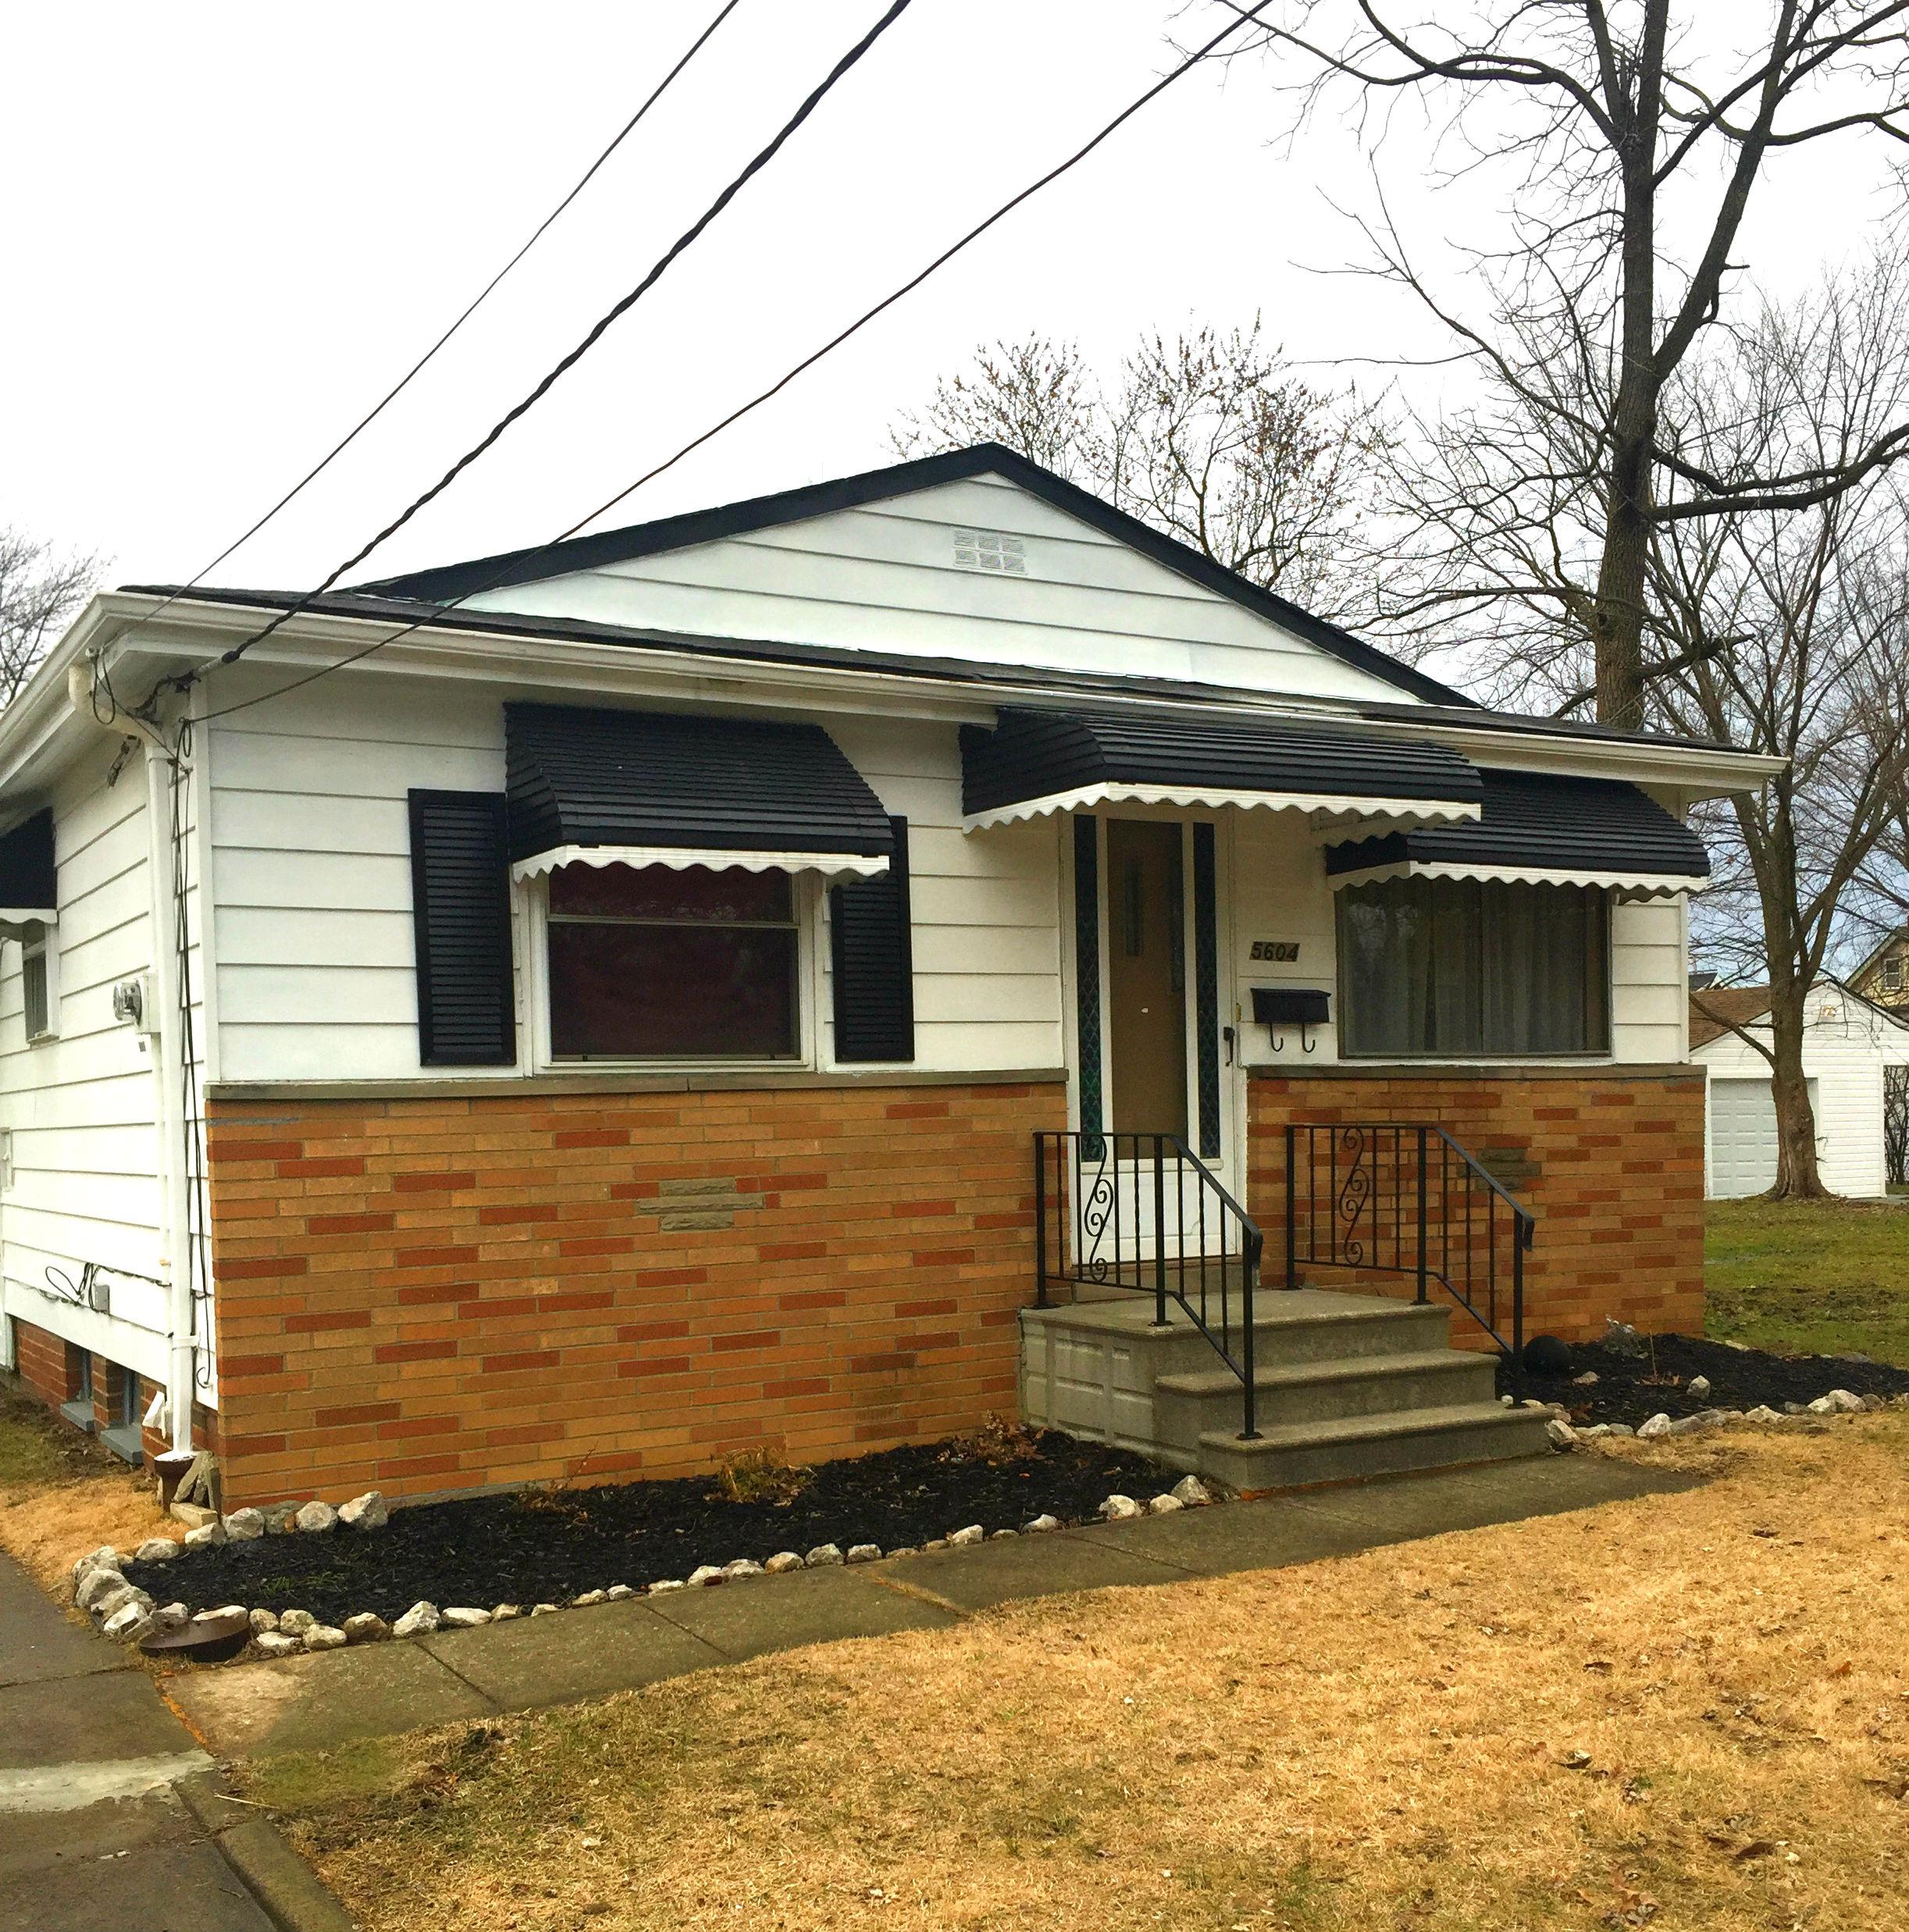 5601 Lafayette Ave., Maple Hts. | 3 bed 1 bath | 960 Sq. Ft. | $36,000